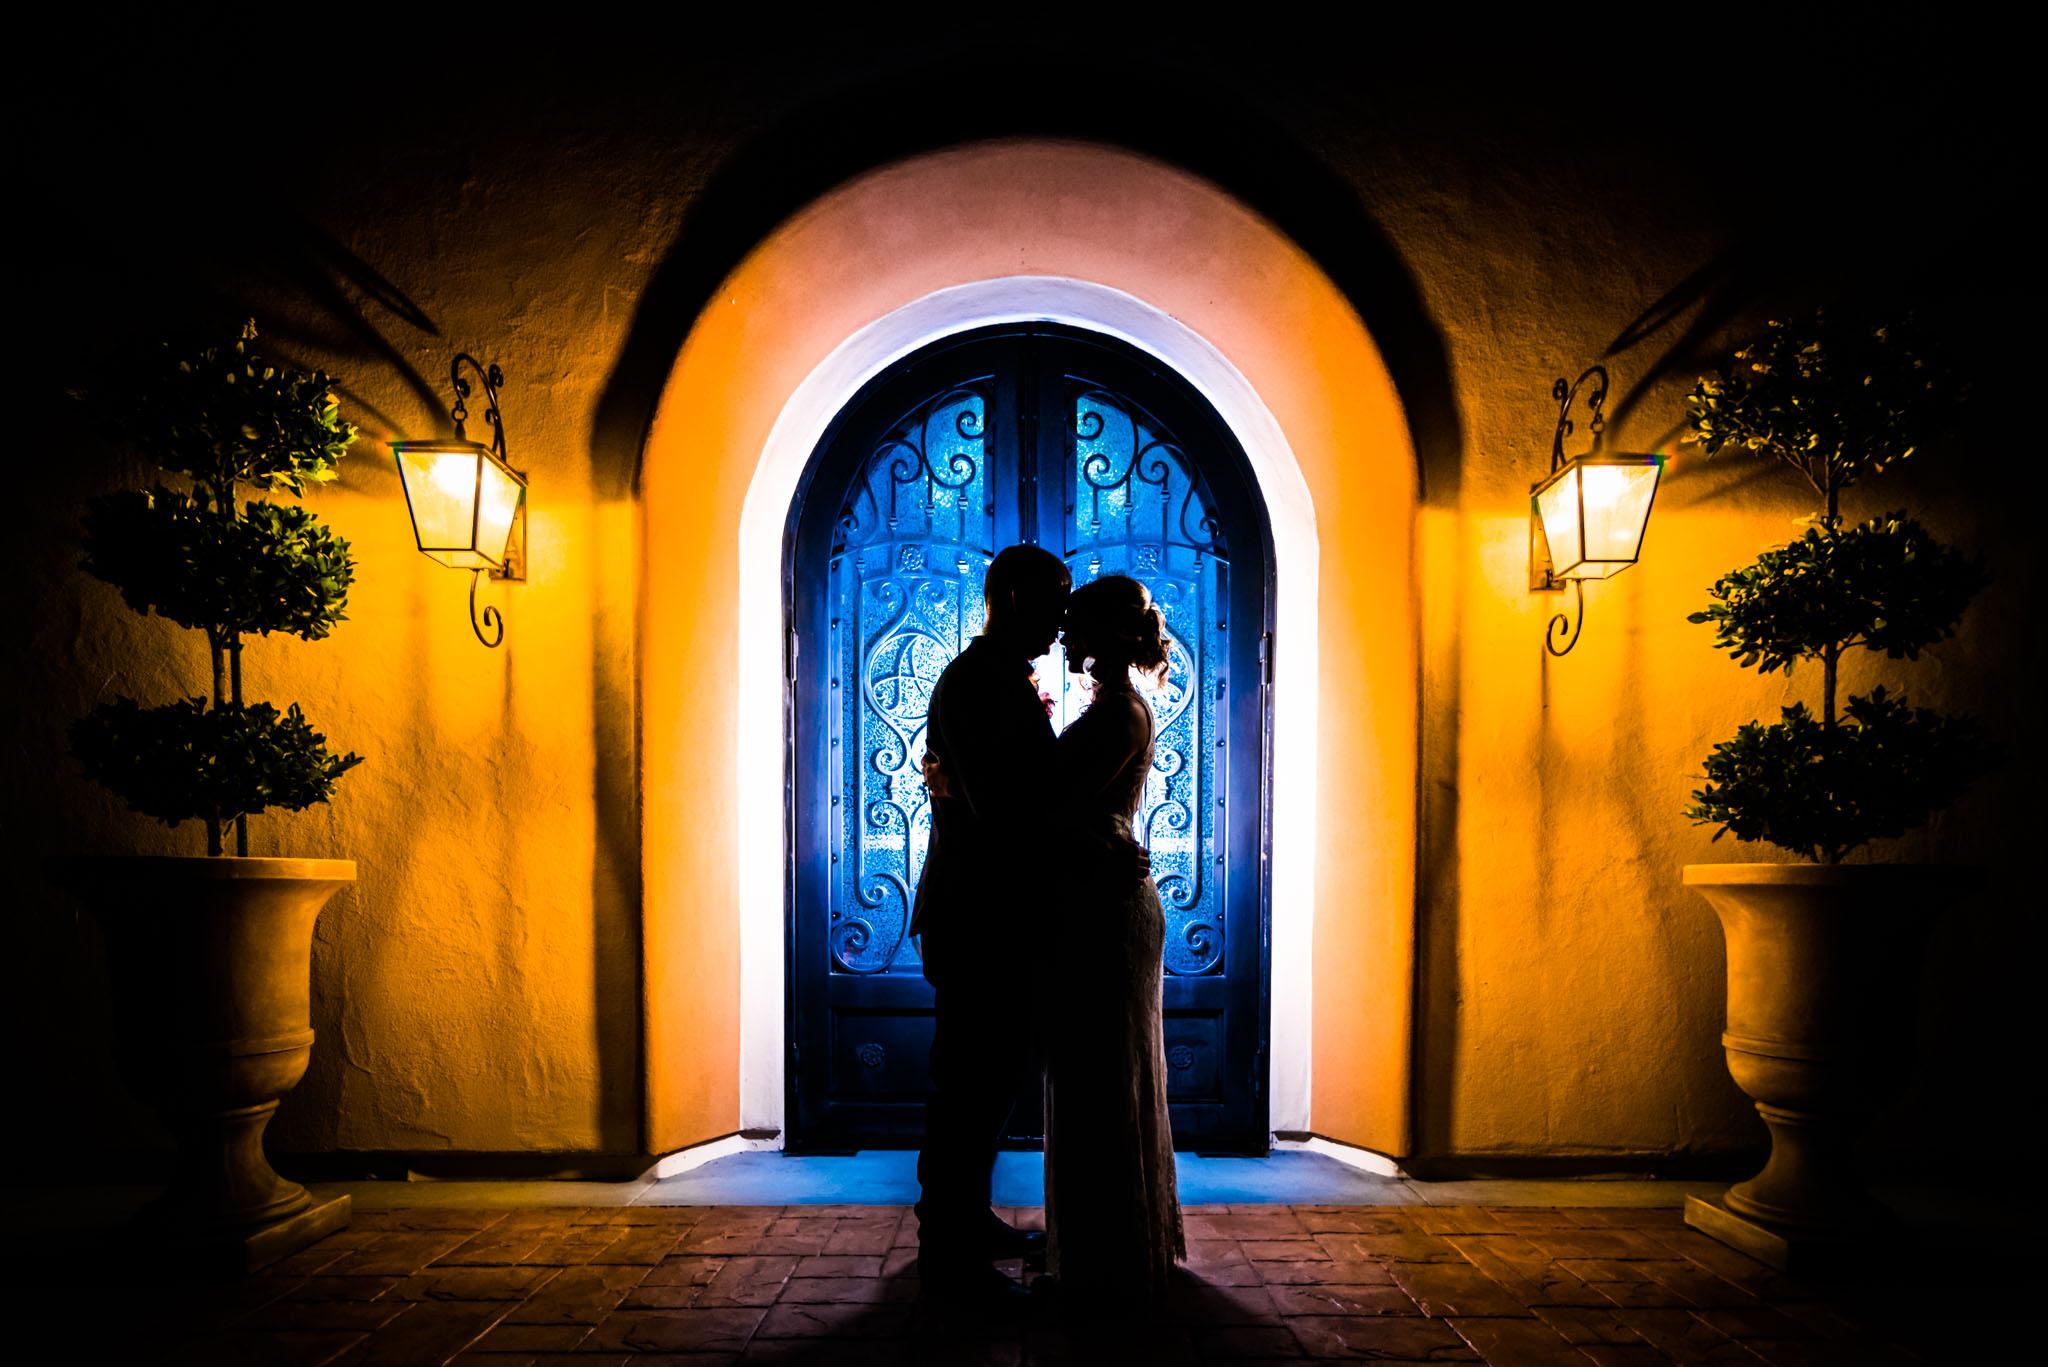 Avensole-Winery-Temecula-Wedding-Josh-and-Olivia--4.JPG